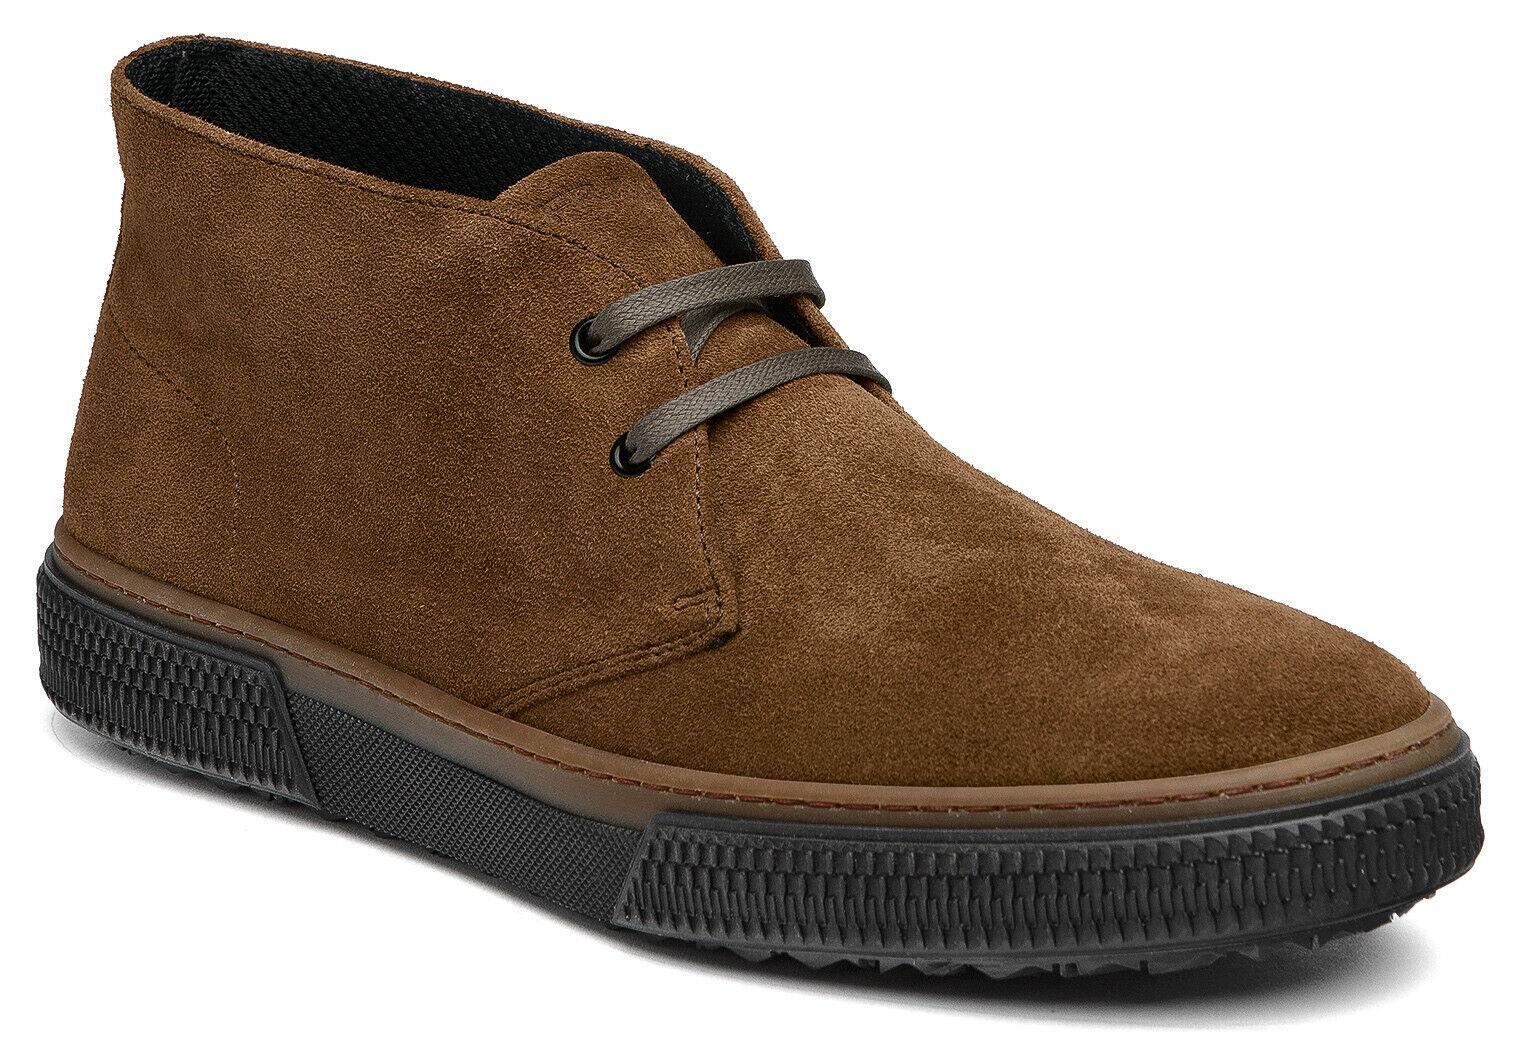 Frau 2815 Schuhe Casual Men Desert Stiefel Geschnürt aus Wildleder Far. Tabak